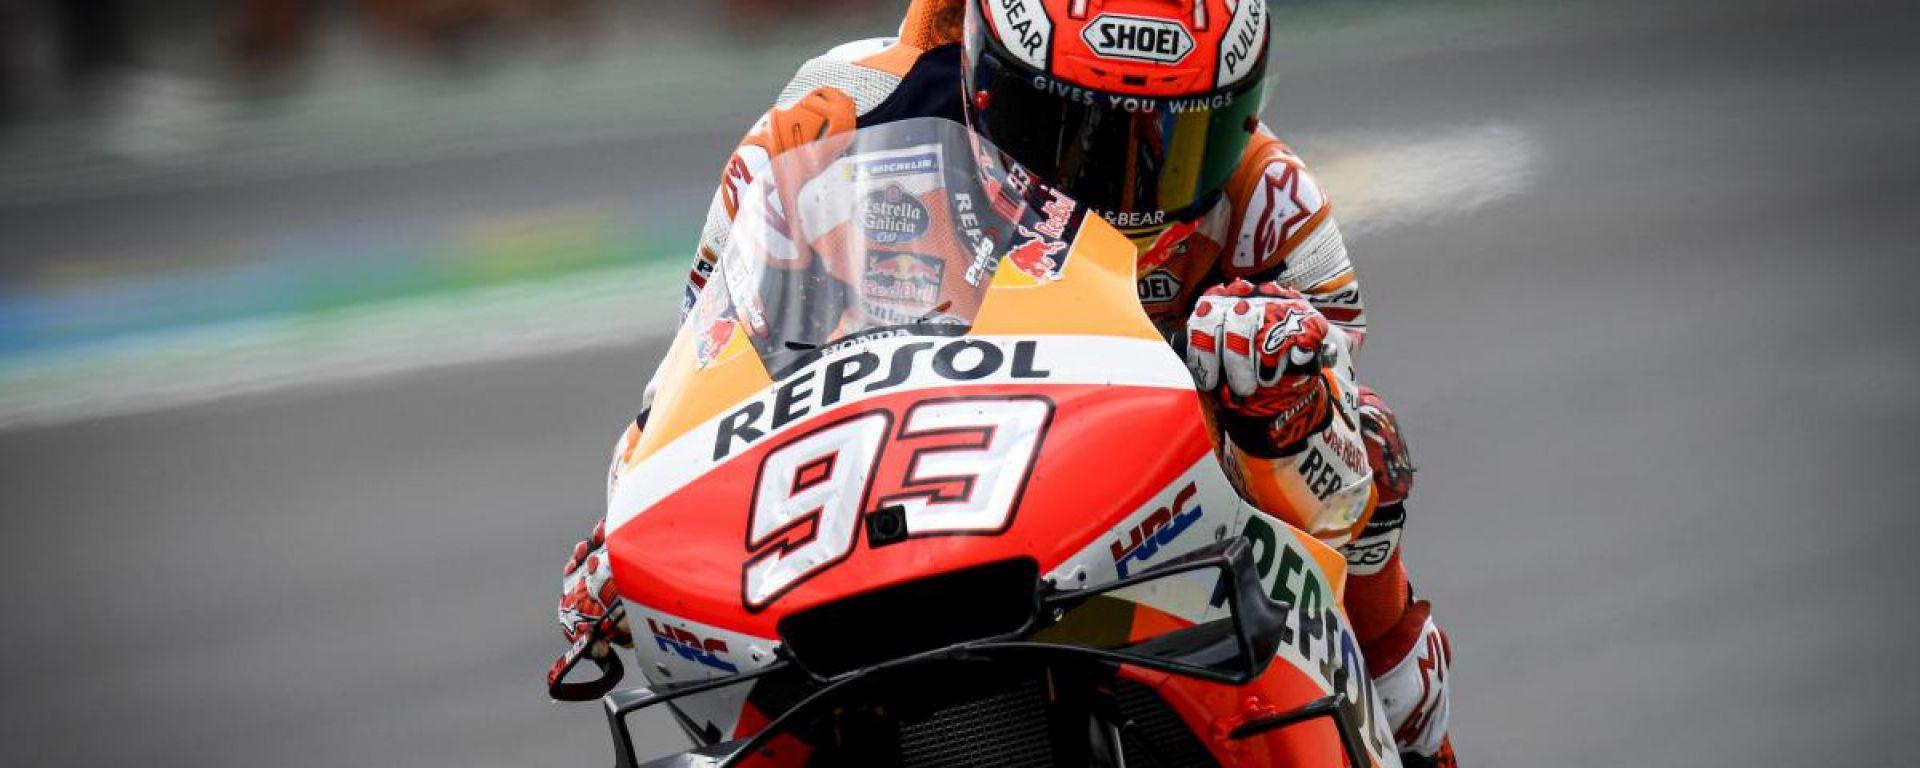 MotoGP Francia, Marquez in pole davanti a Petrucci e Miller